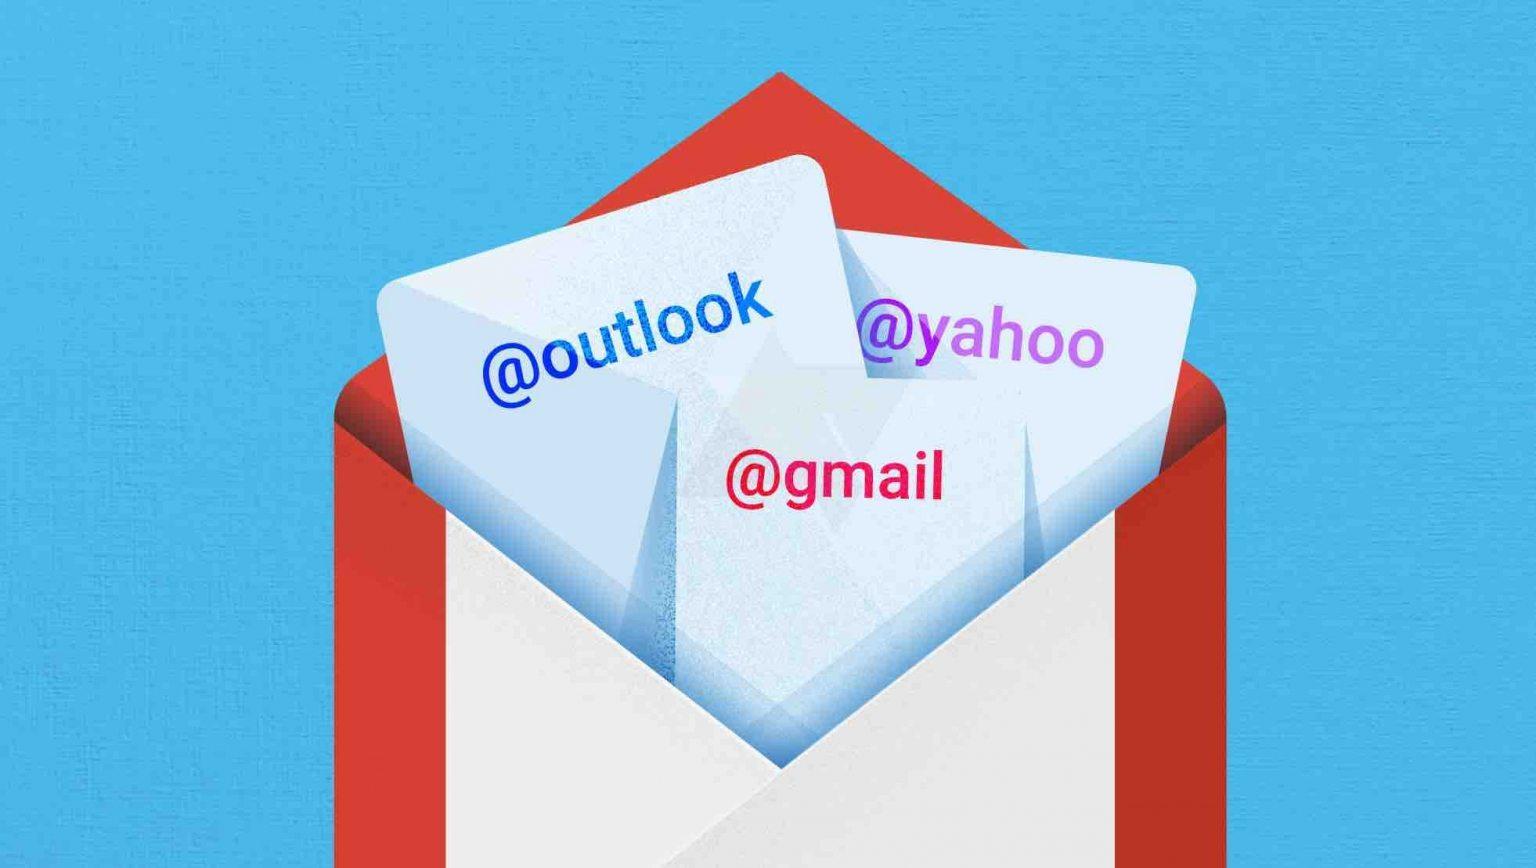 google-gmailify-gmail-768x434@2x